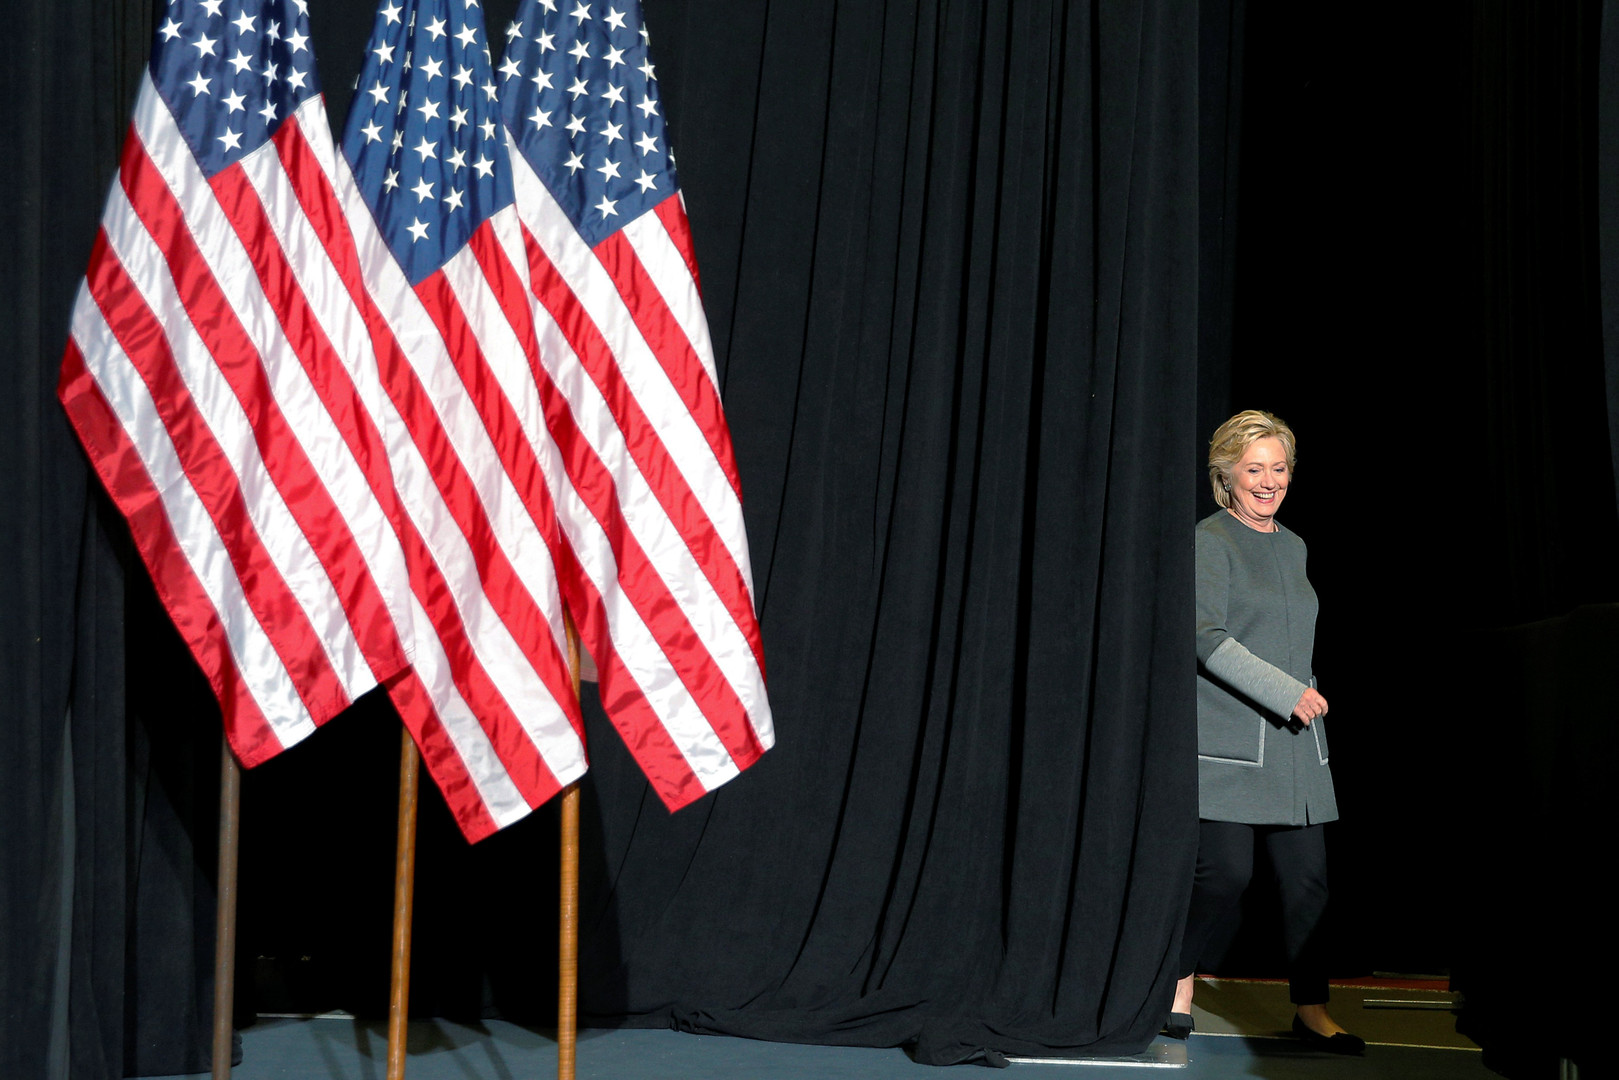 The Times: штаб Клинтон опасается «октябрьского сюрприза» с публикацией писем